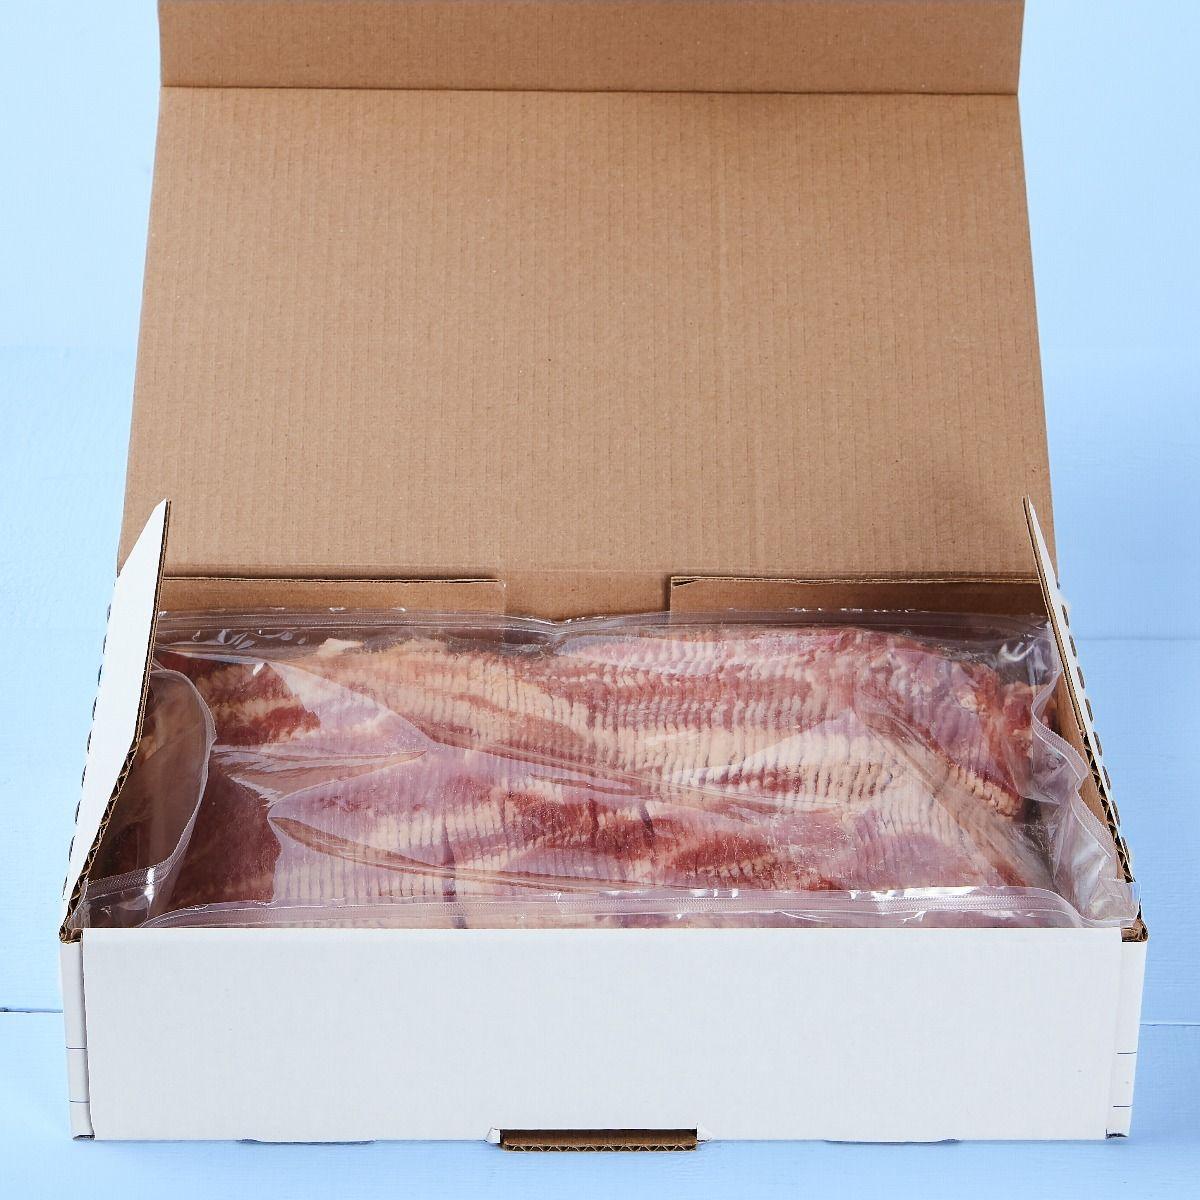 Bacon, applewood smoke flavour (16-18 sl/lb)